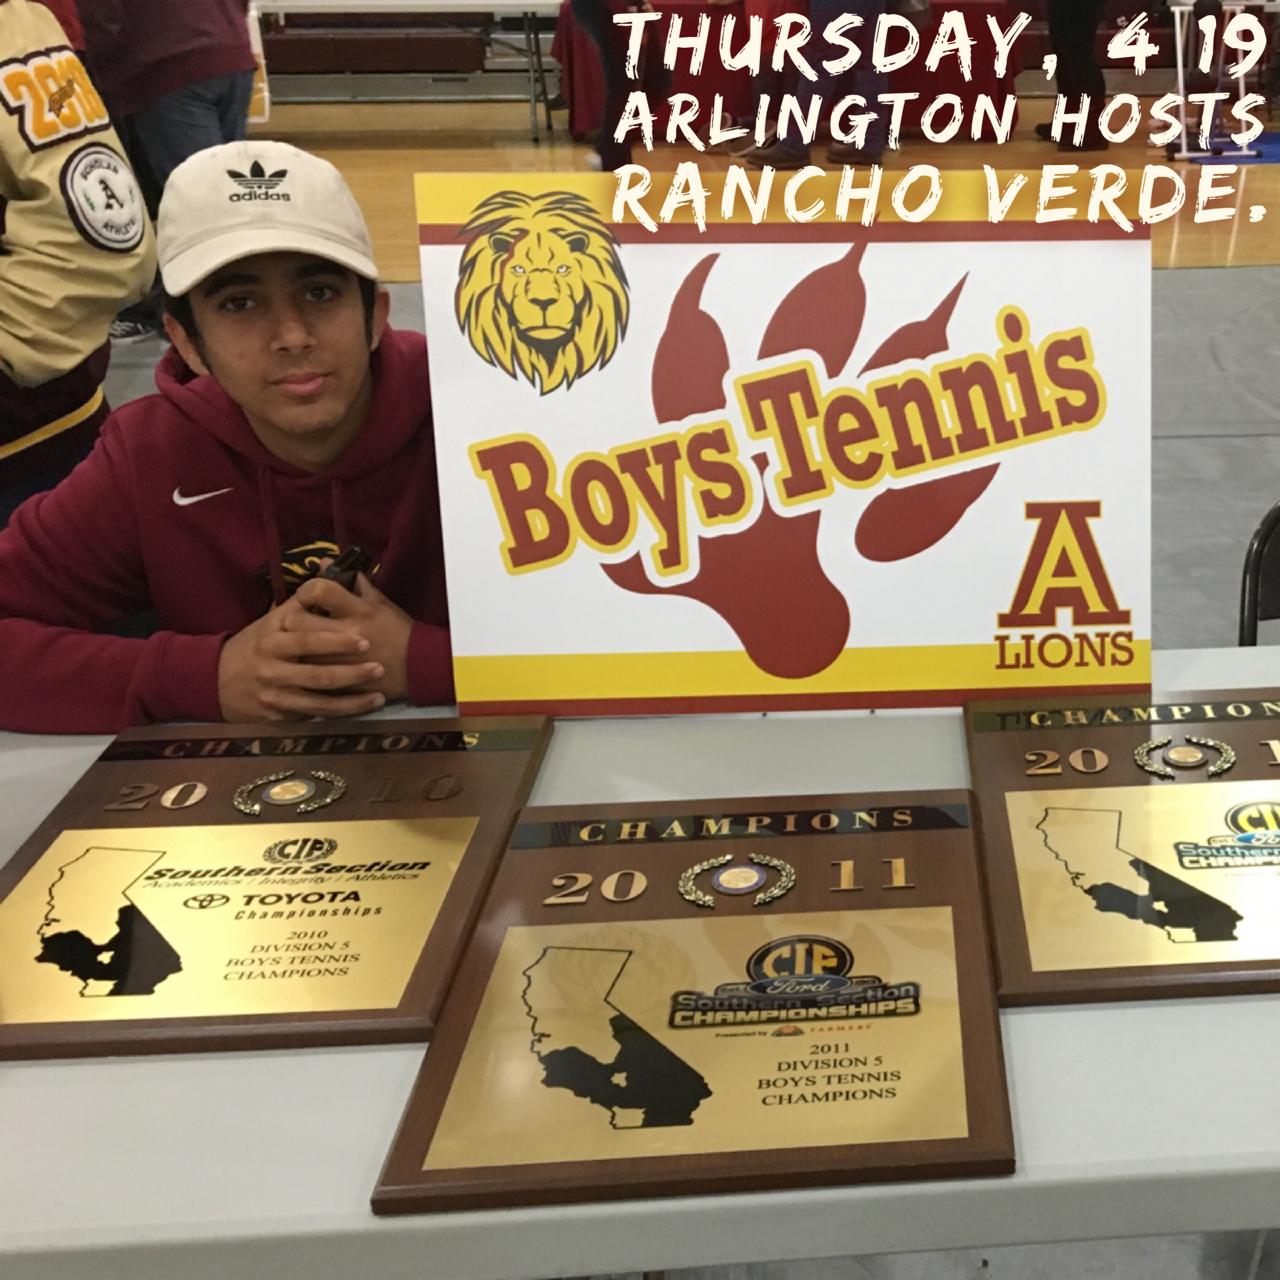 Arlington Tennis hosts Rancho Verde on Thursday, 4/19.